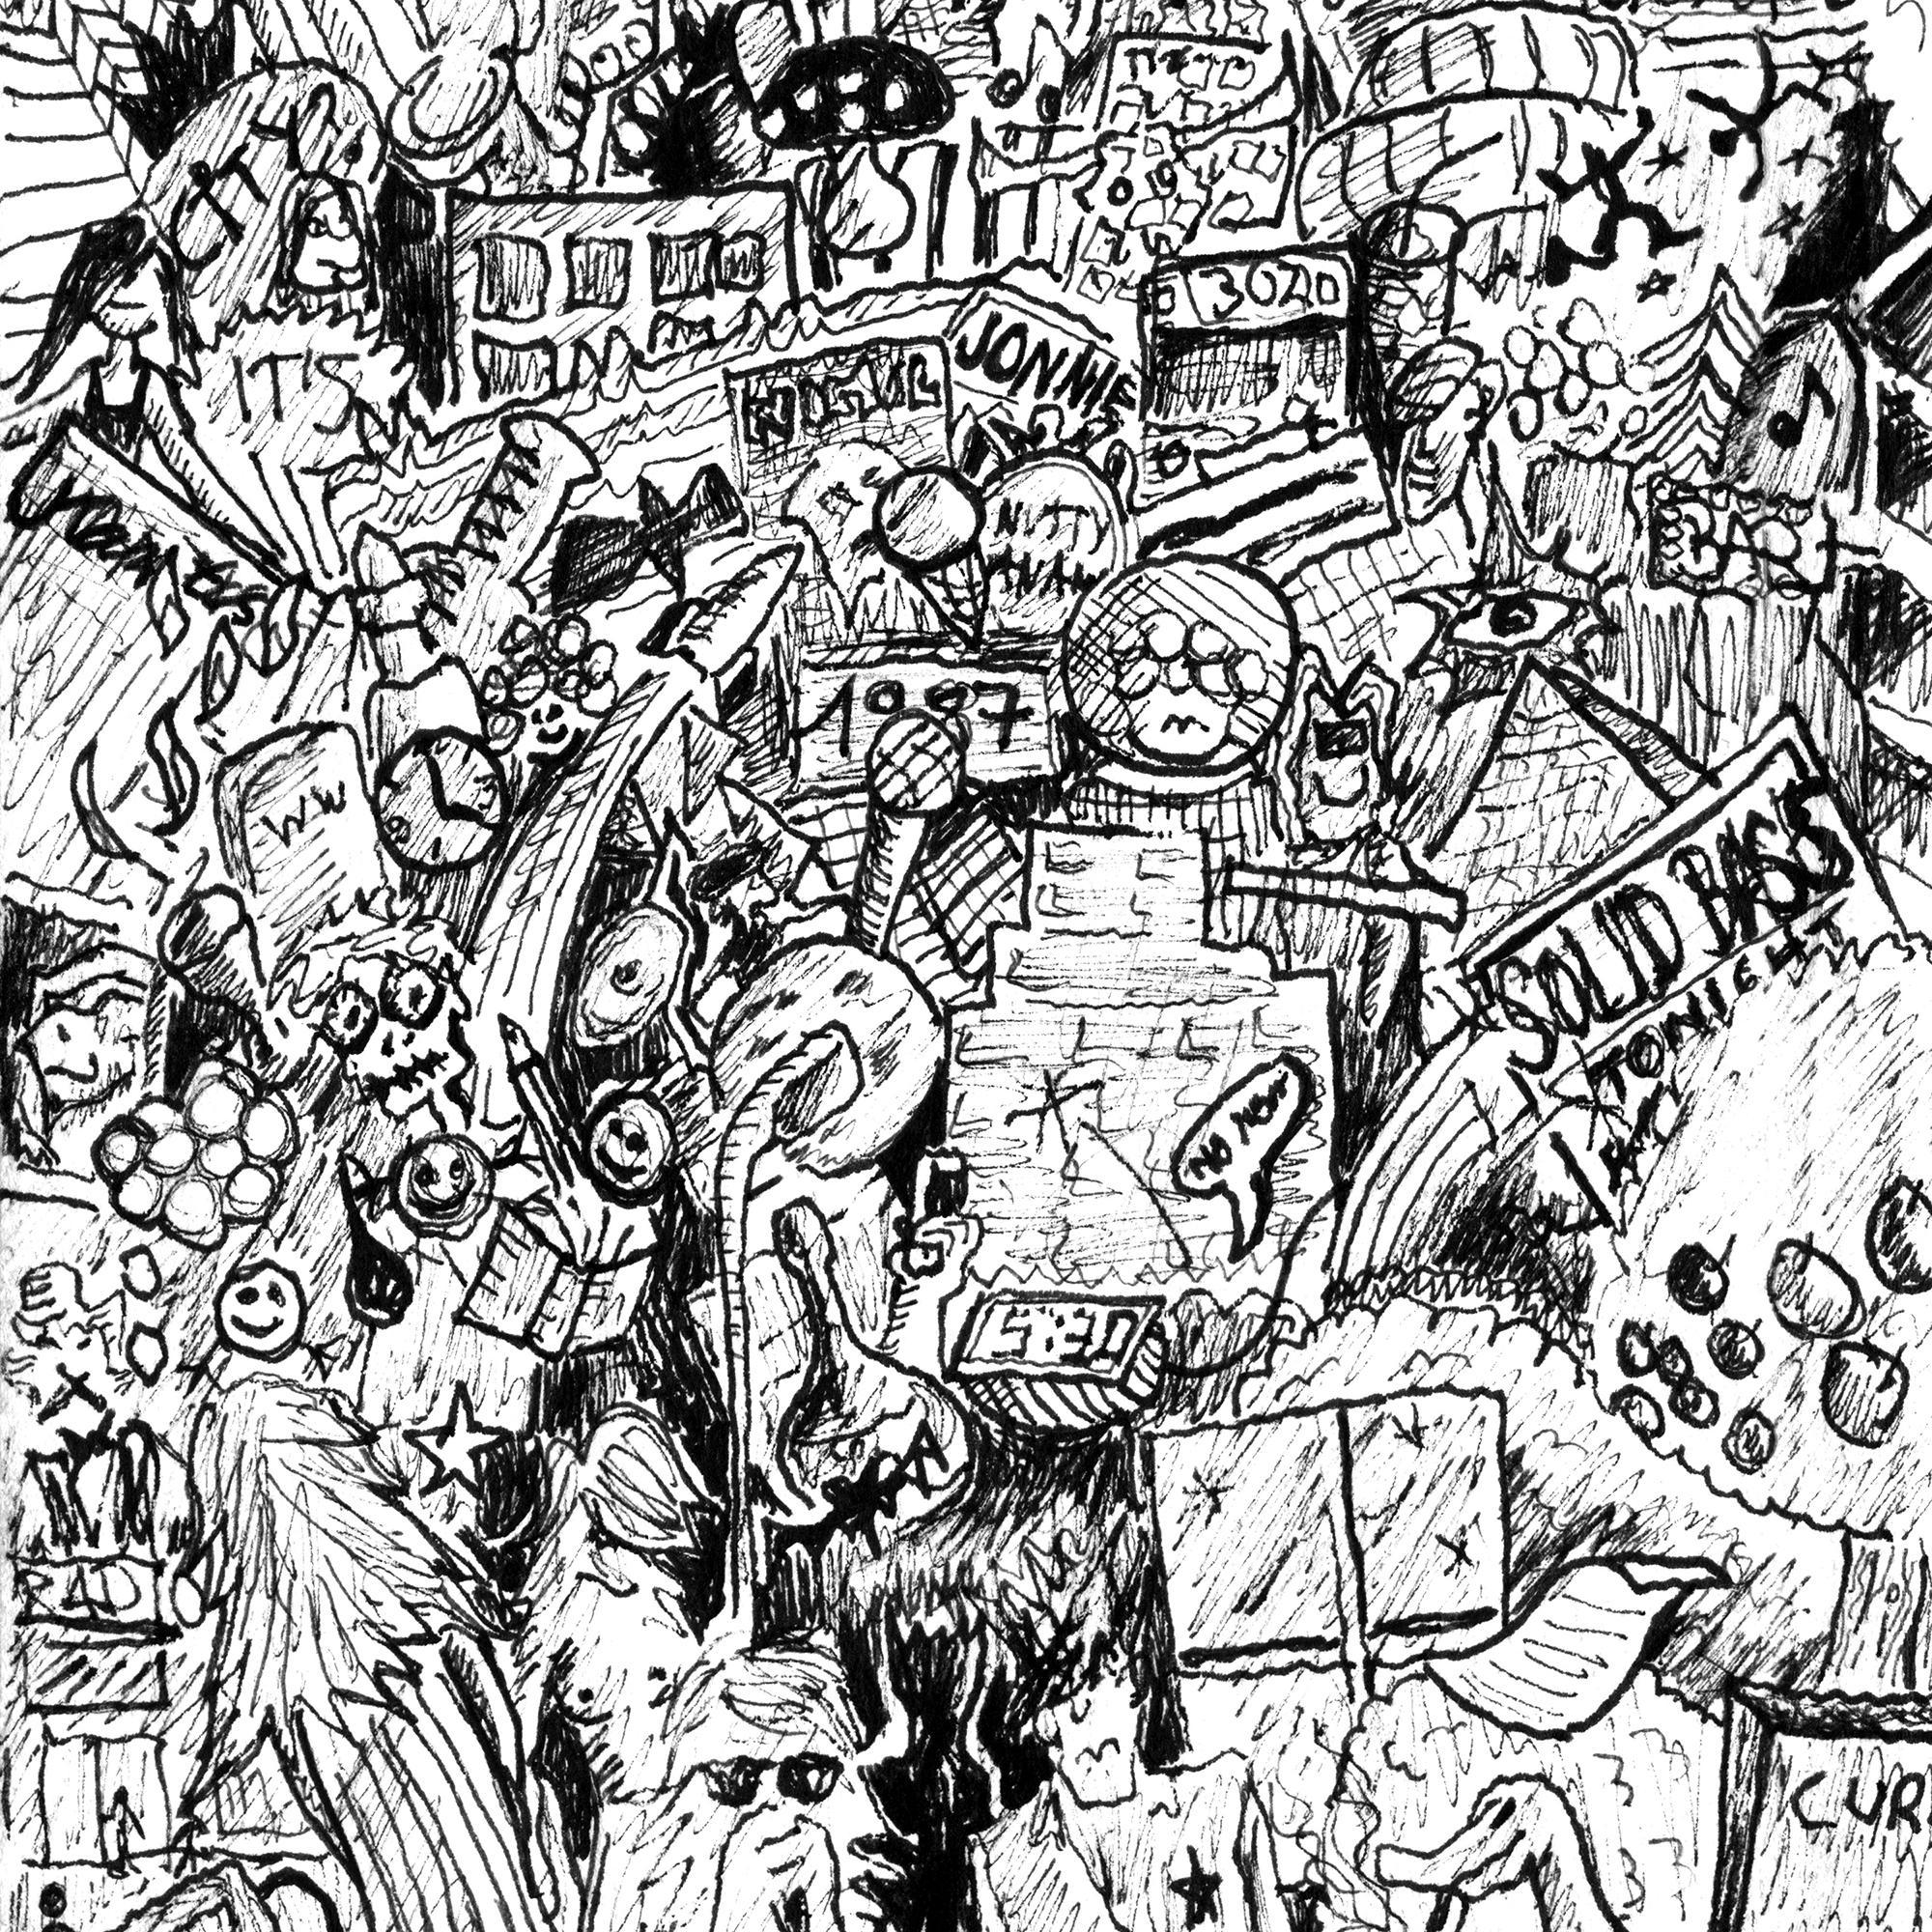 Matias Aguayo & The Desdemonas: Sofarnopolis